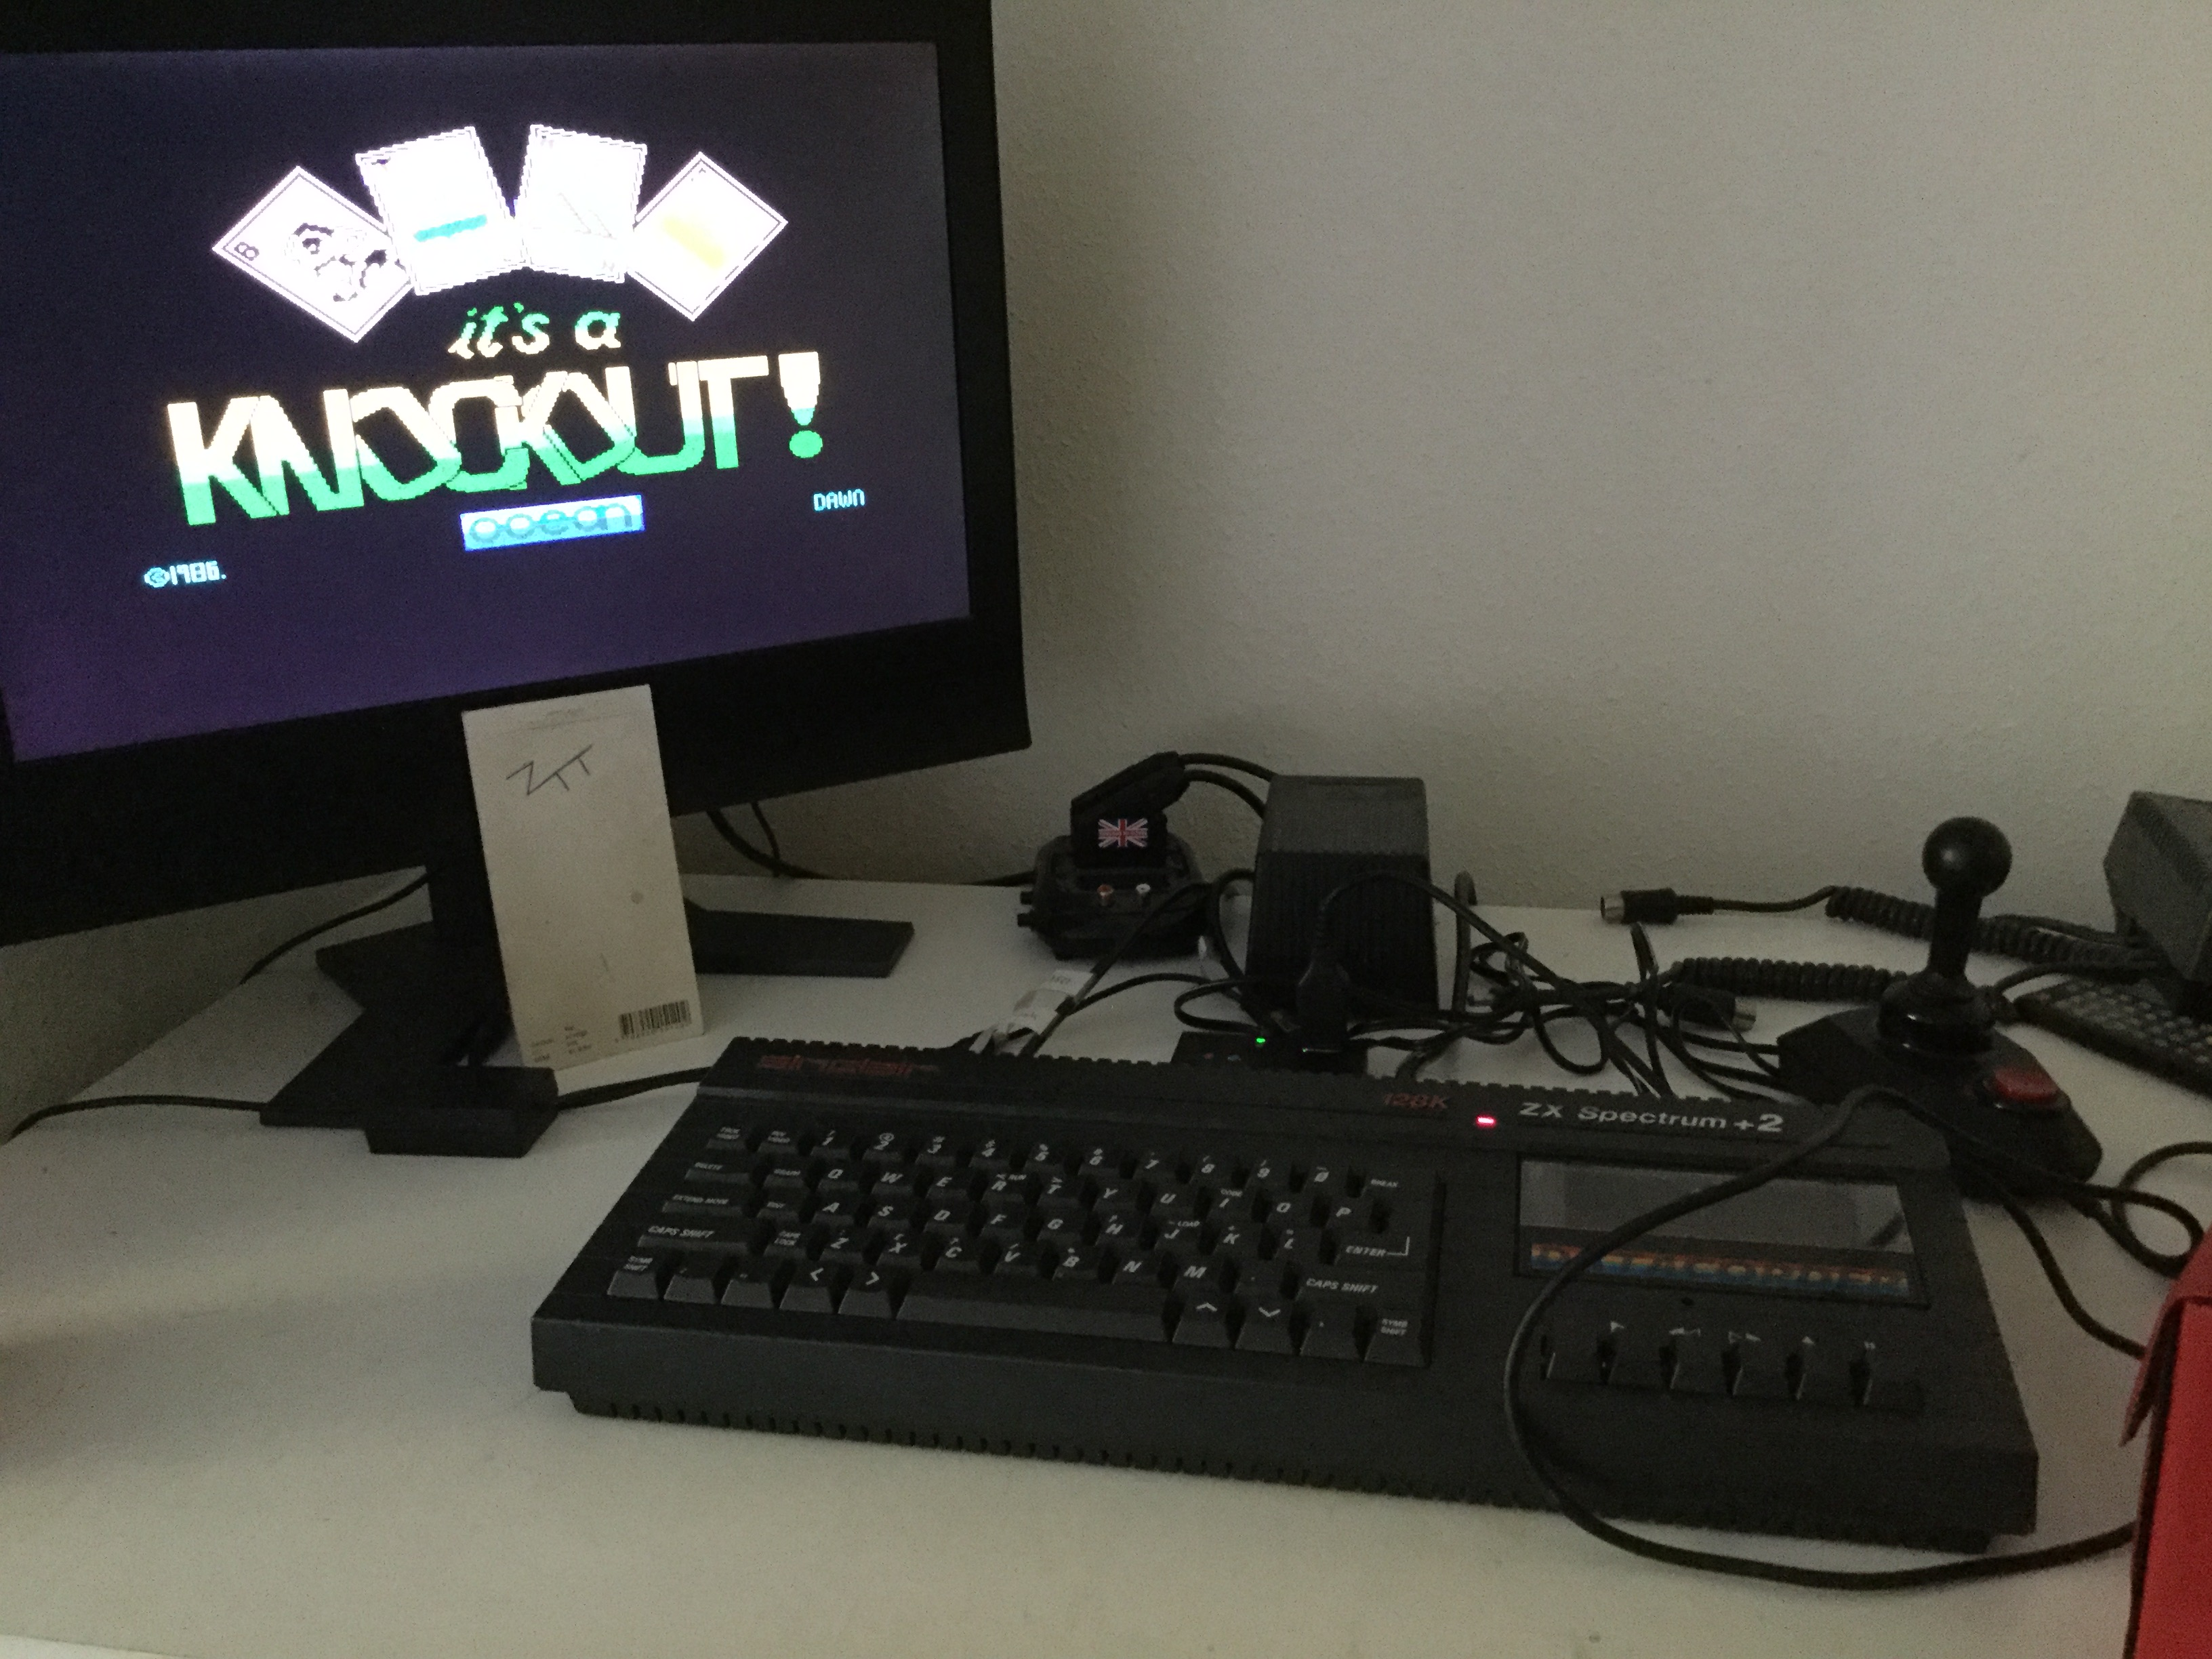 Frankie: It's a Knockout (ZX Spectrum) 23 points on 2020-09-18 06:07:33